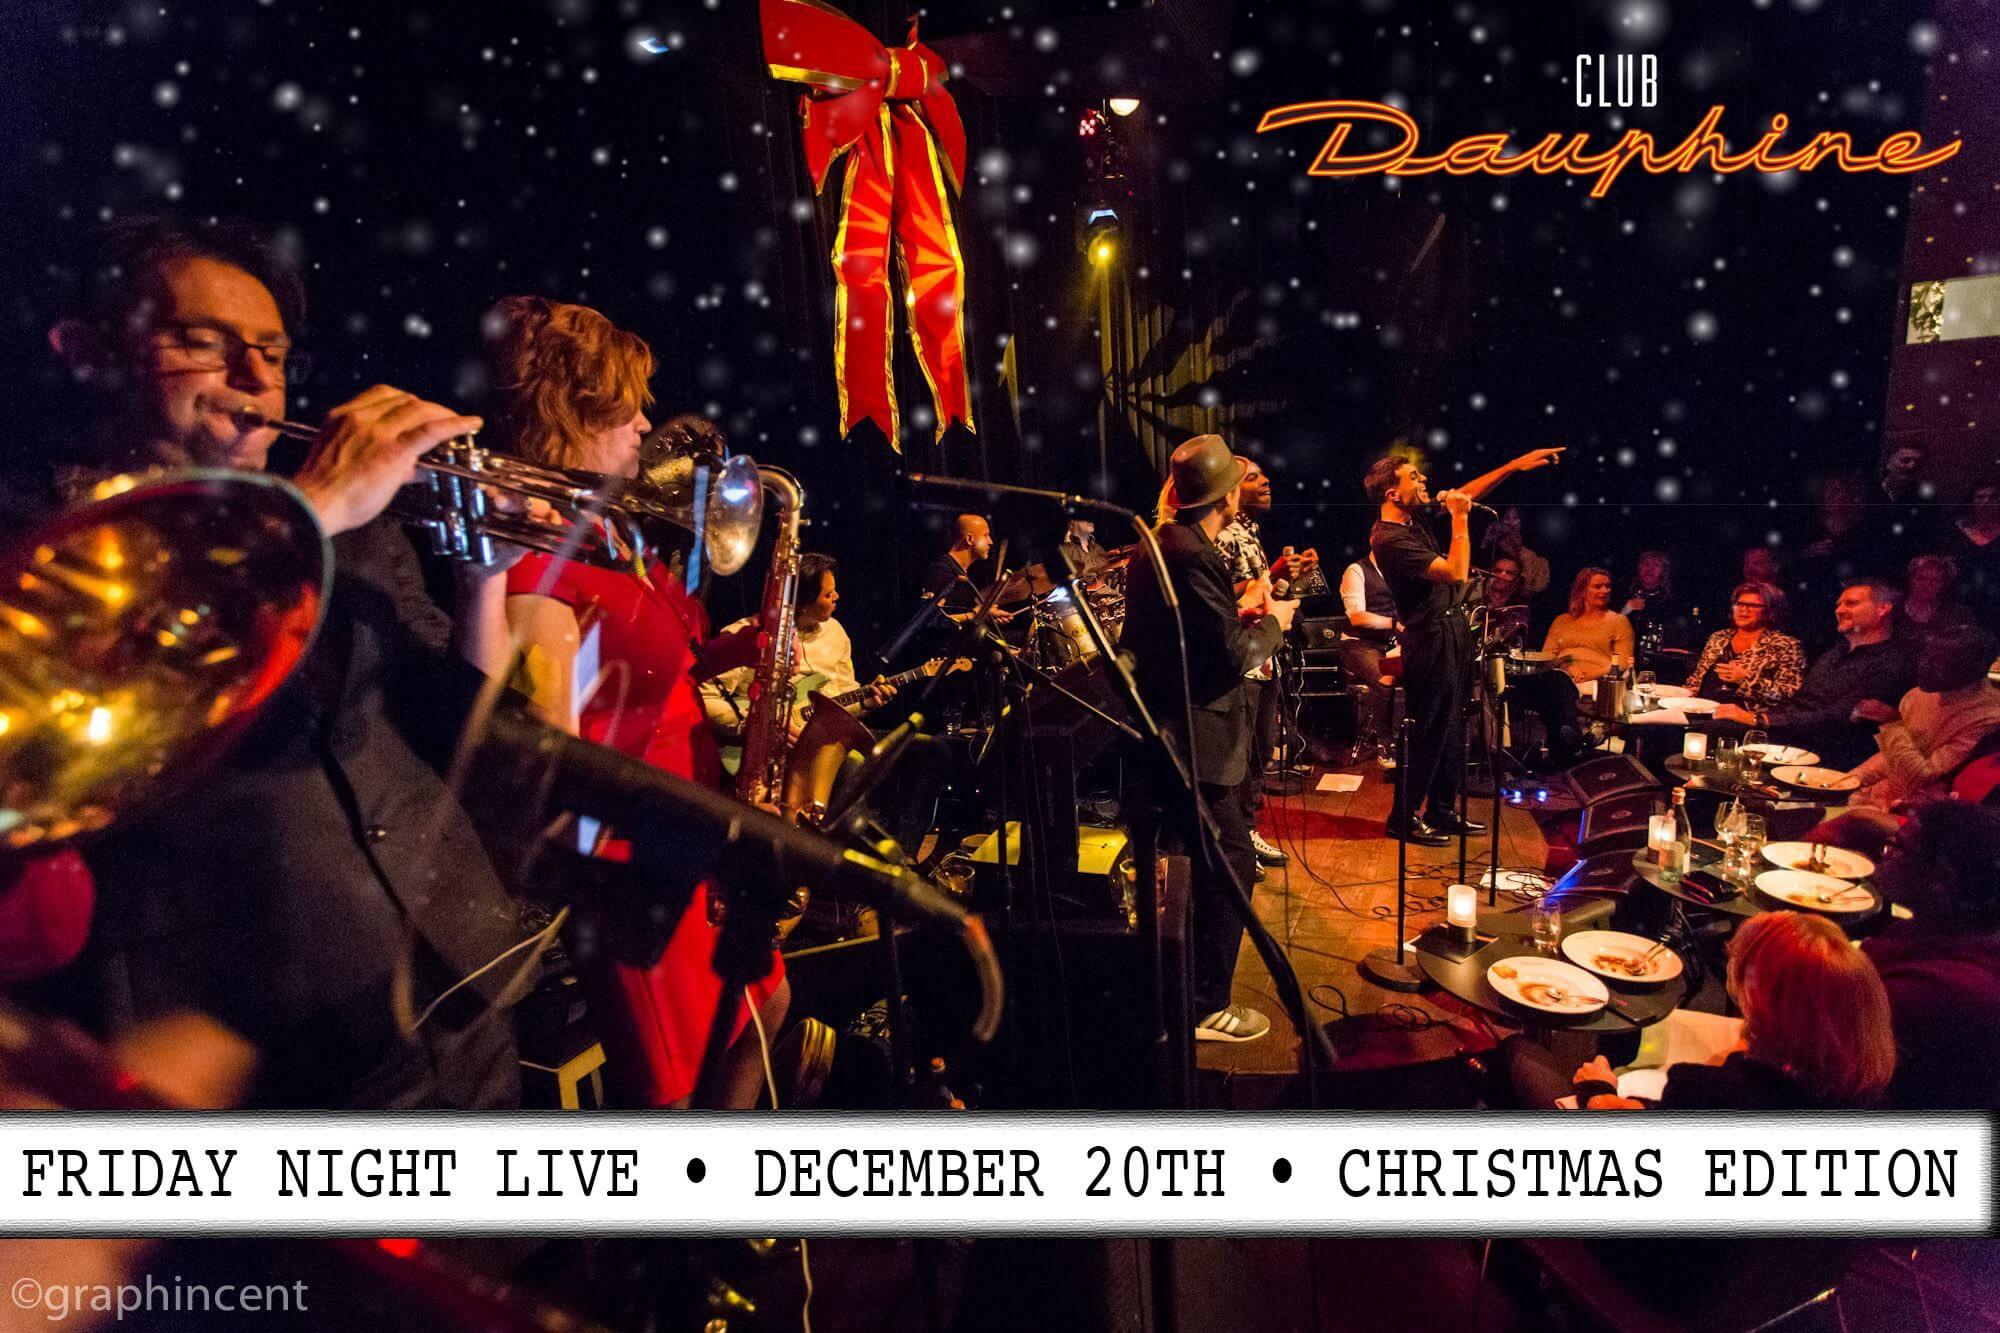 Club Dauphine-Friday Night Christmas Edition- 20 Dec